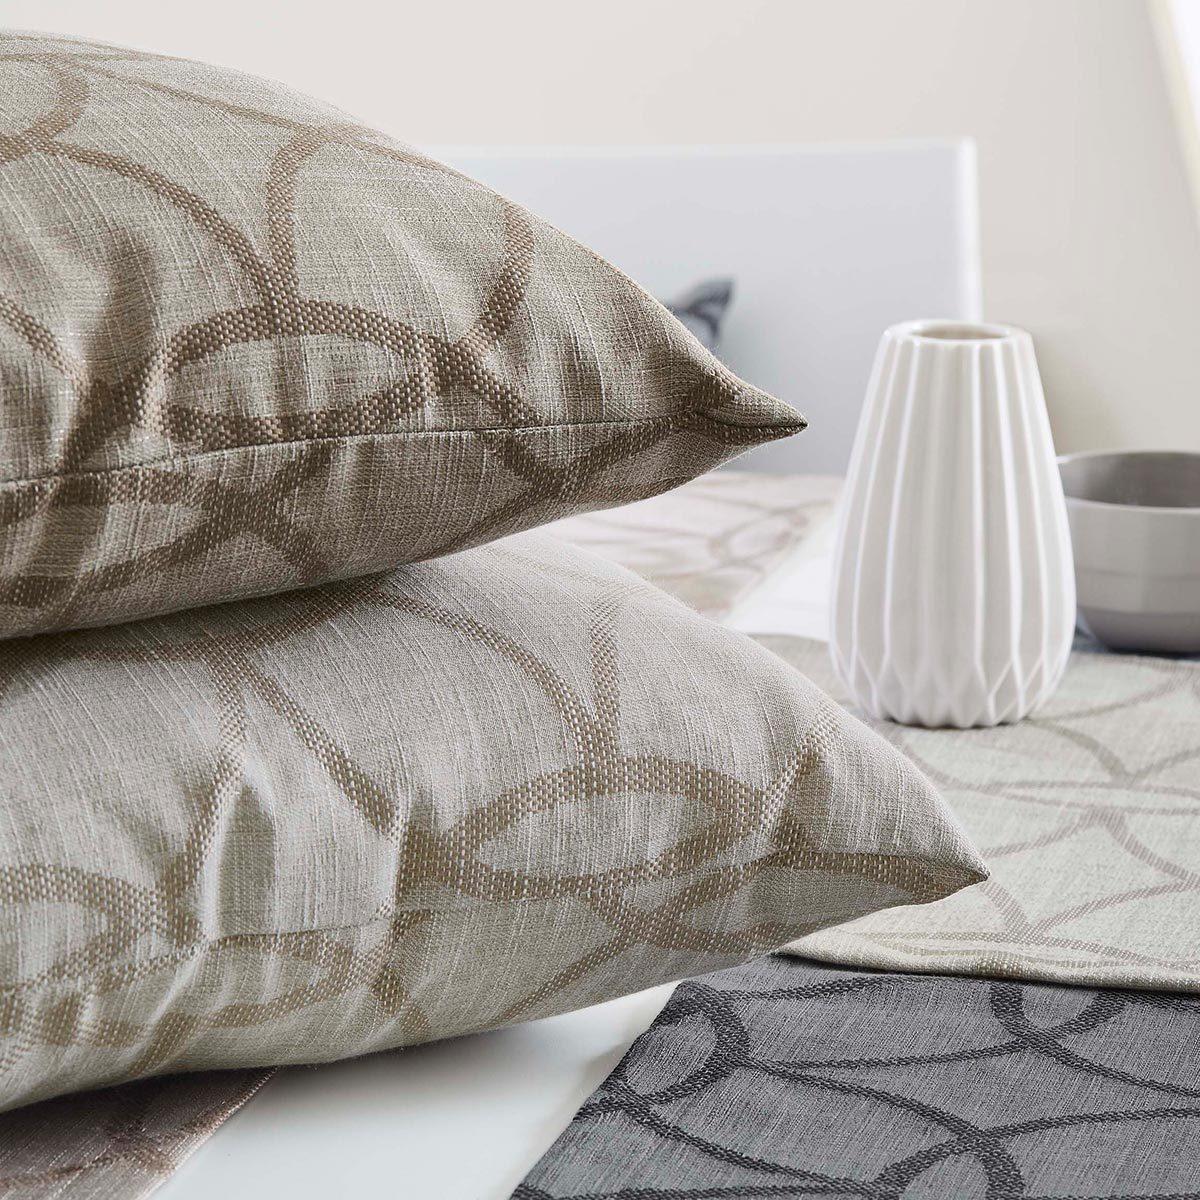 sun garden jacquard kissenh lle prestige g nstig online kaufen bei bettwaren shop. Black Bedroom Furniture Sets. Home Design Ideas